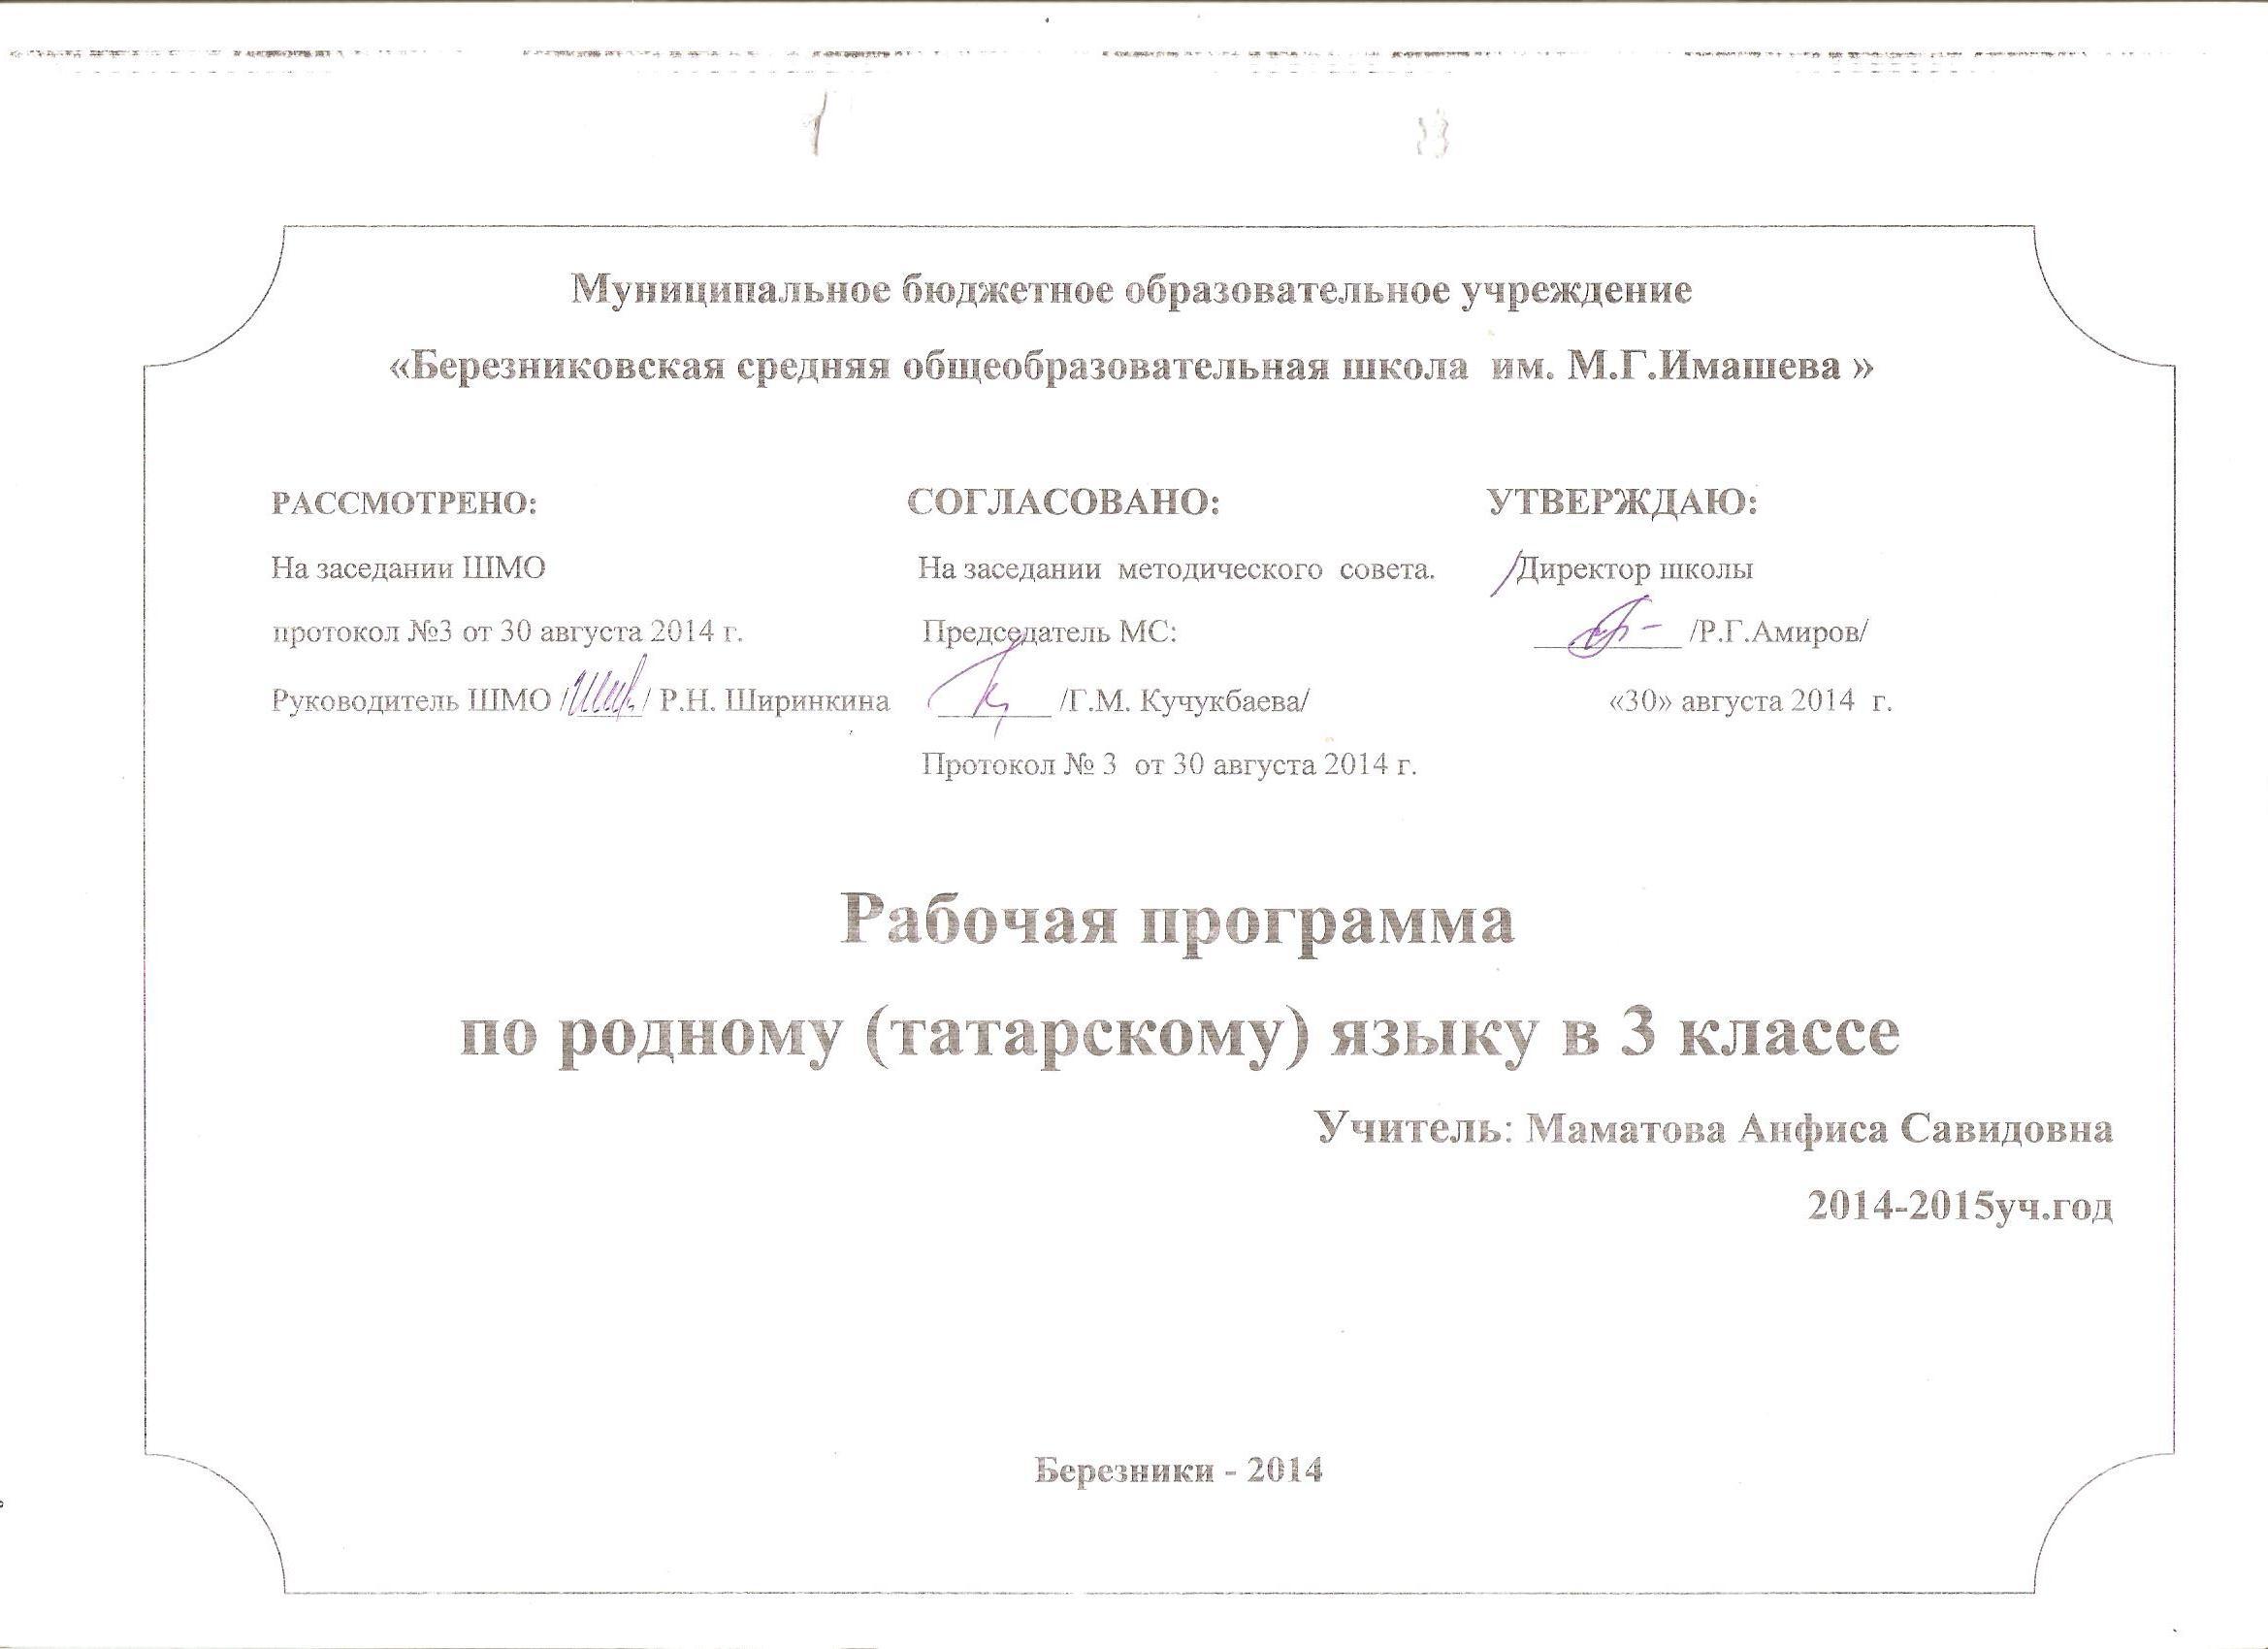 C:\Users\Маматова\AppData\Local\Microsoft\Windows\Temporary Internet Files\Content.Word\Рисунок (129).jpg